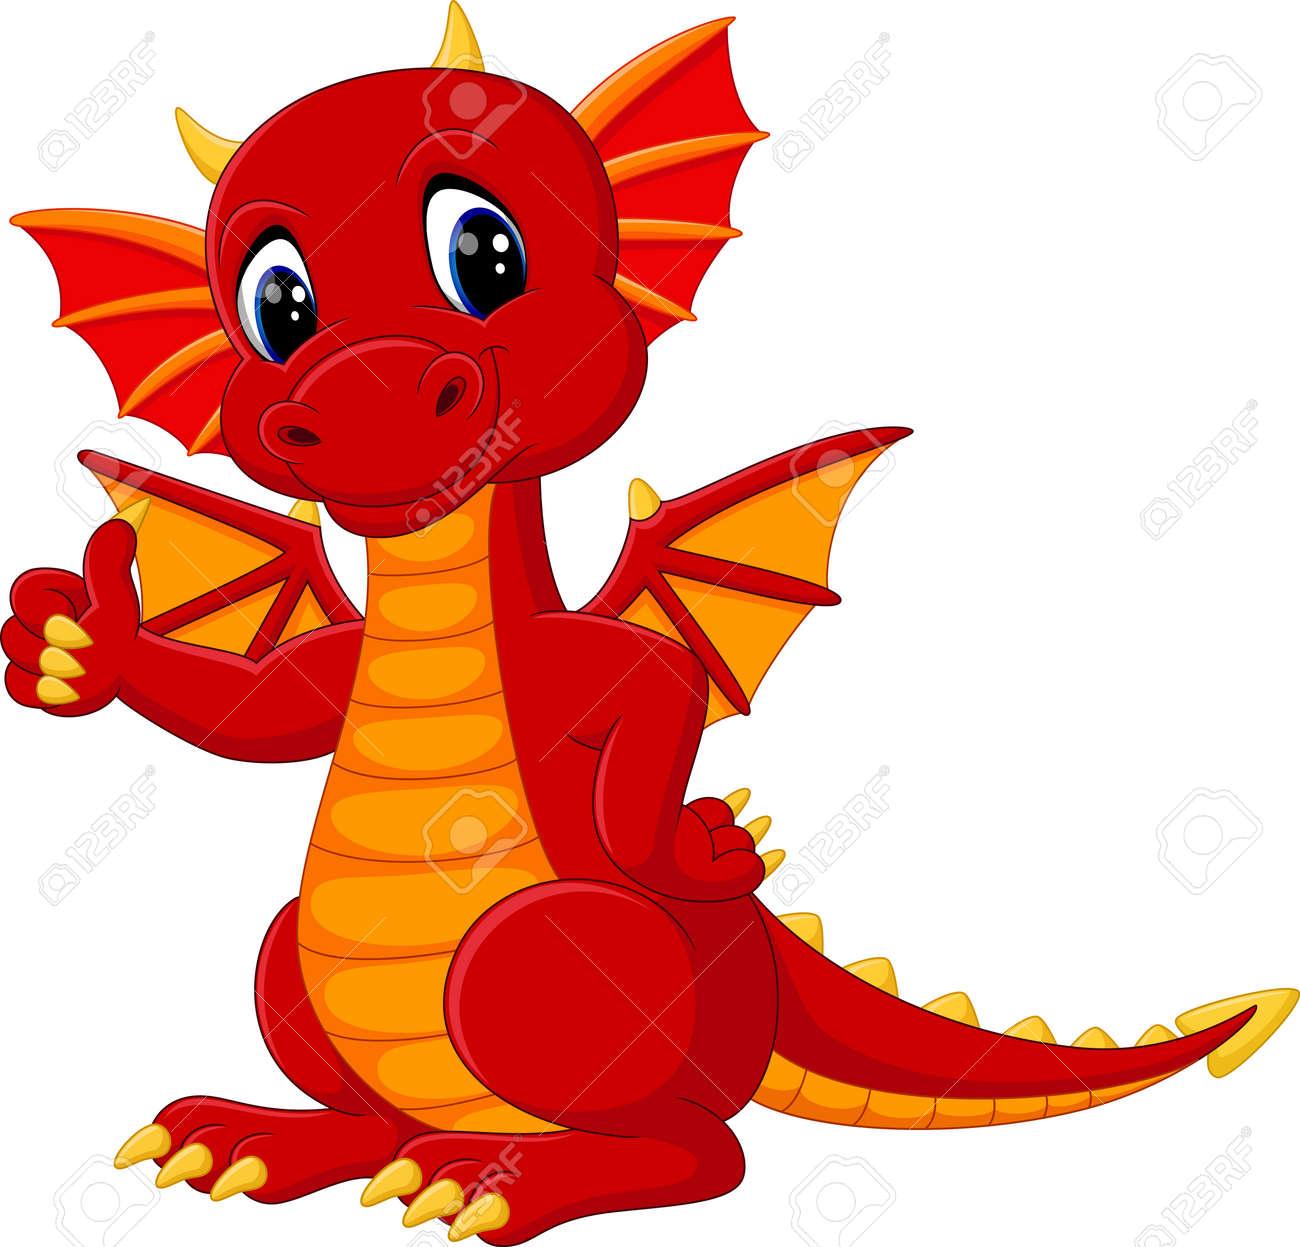 cute dragon cartoon - 58514378